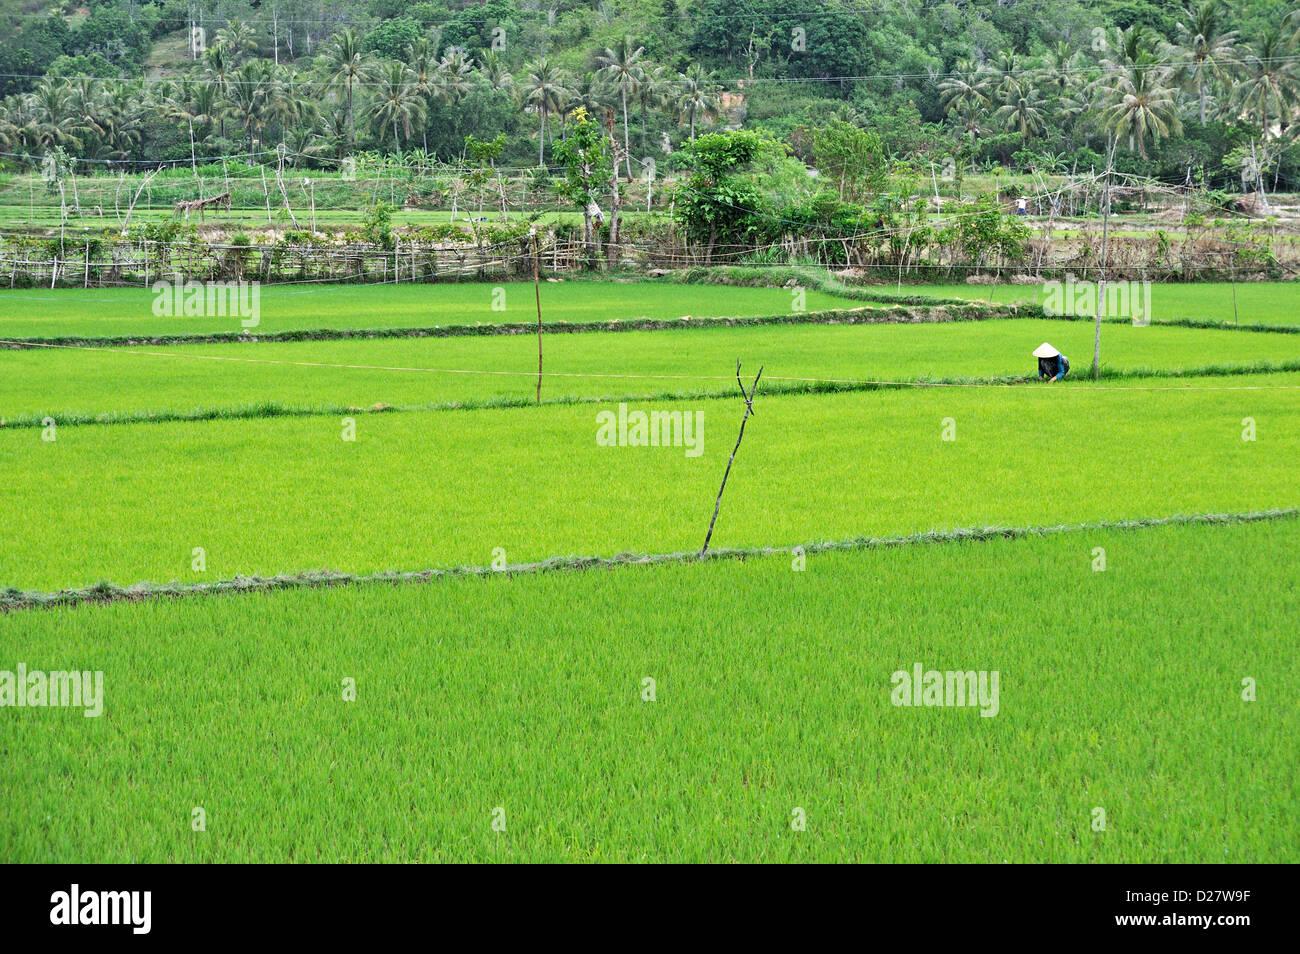 People working in rice fields near Hue, Vietnam Stock Photo